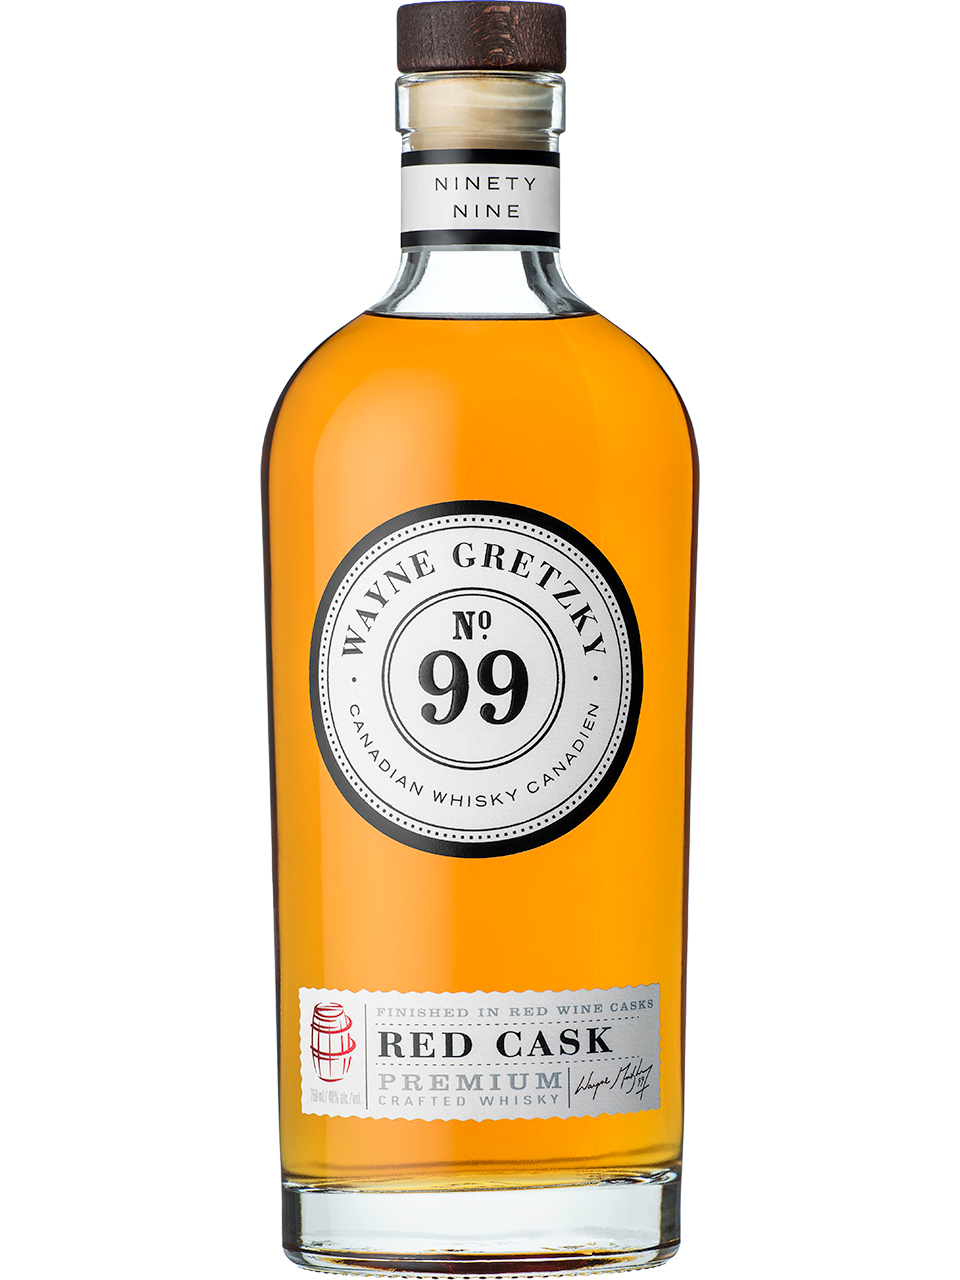 Wayne Gretzky No. 99 Red Cask Whisky